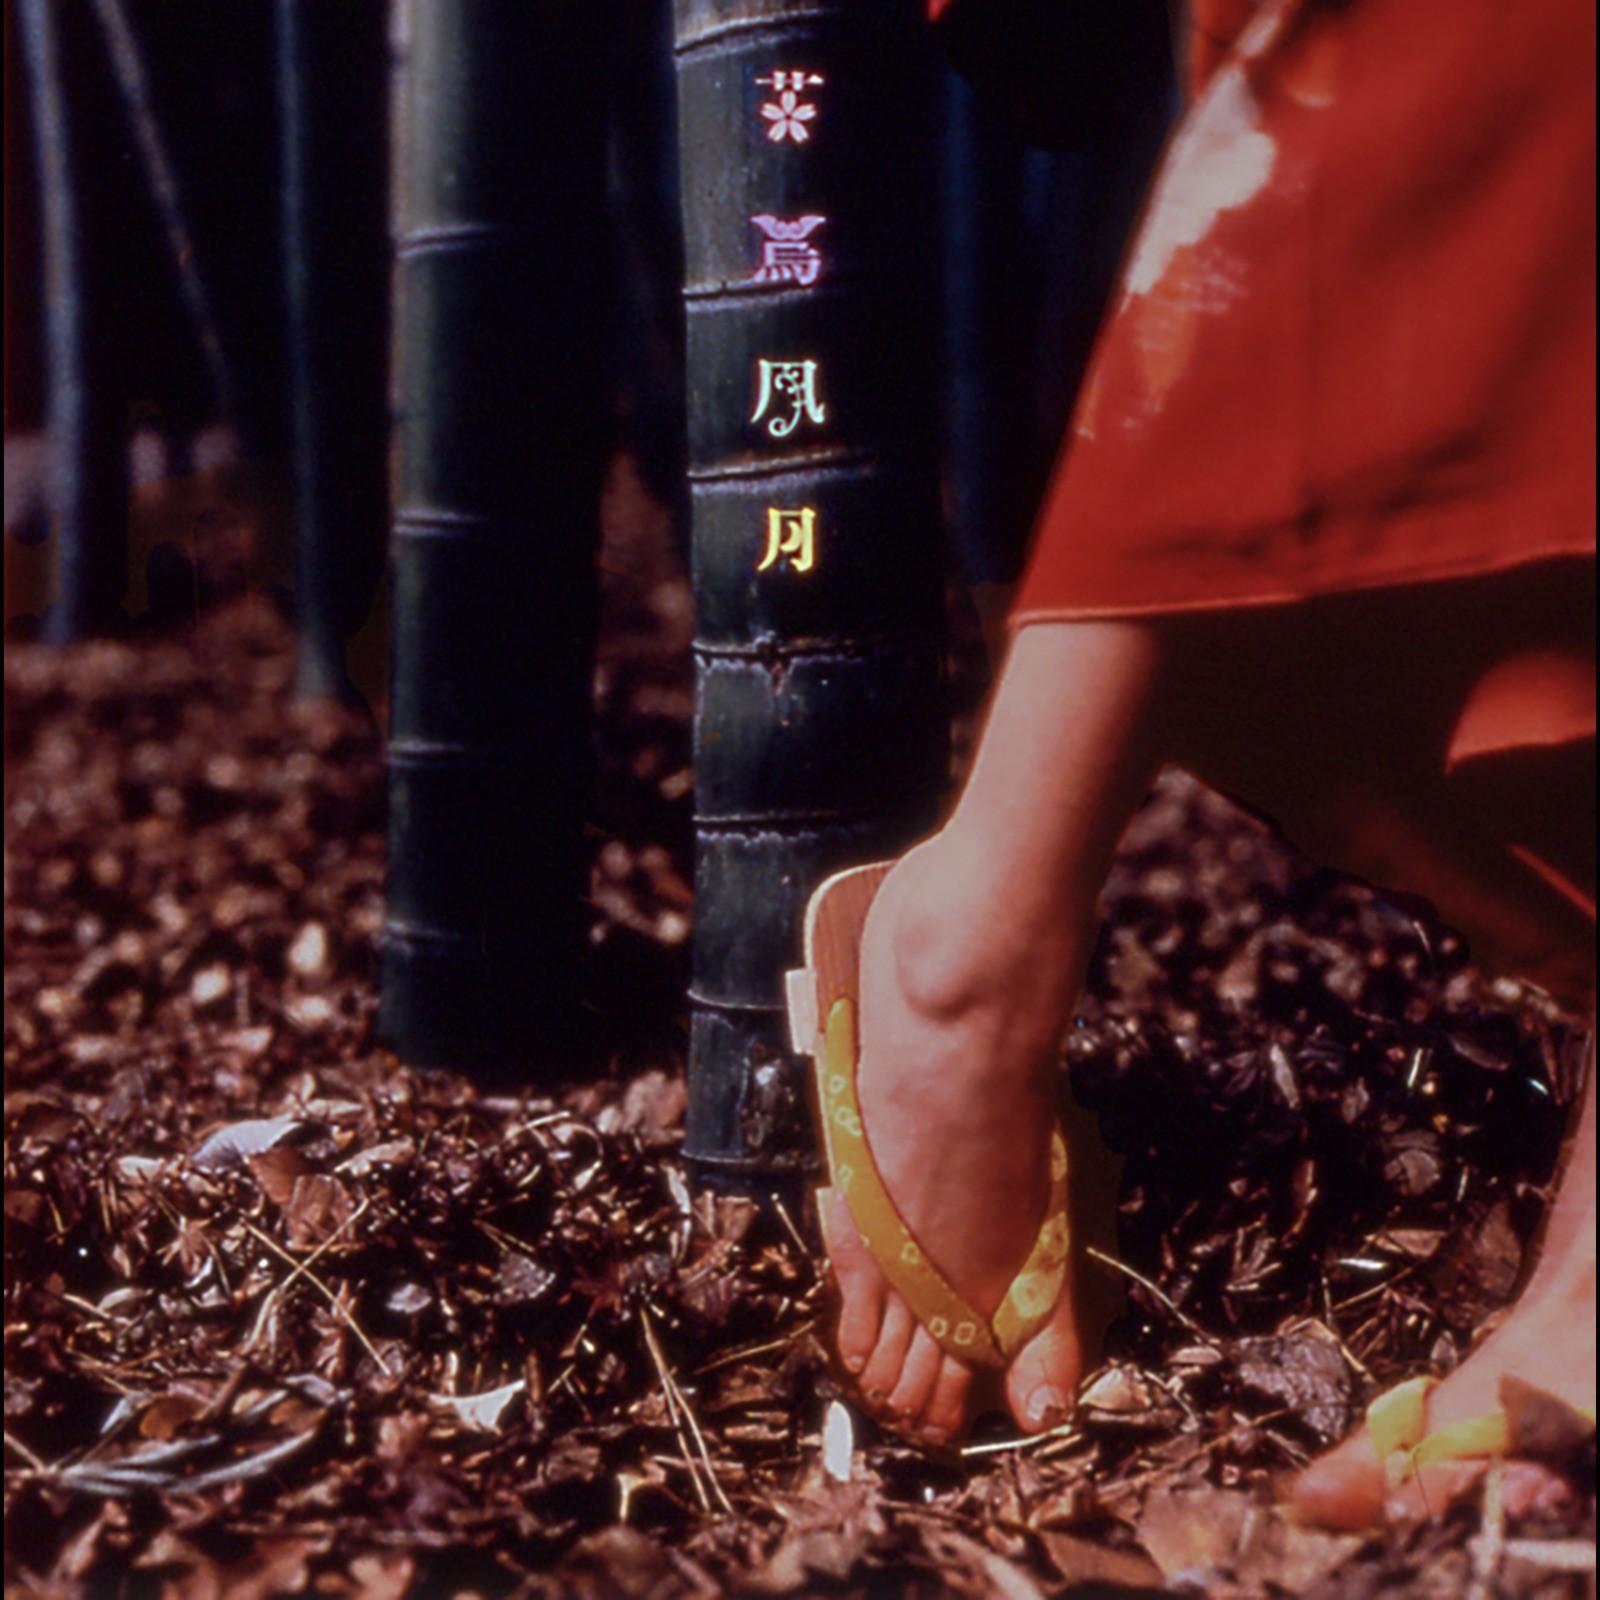 [Album] スピッツ (Spitz) – 花鳥風月 (30th Anniversary Edition – 2021) [FLAC + MP3 / WEB] [1999.03.25]